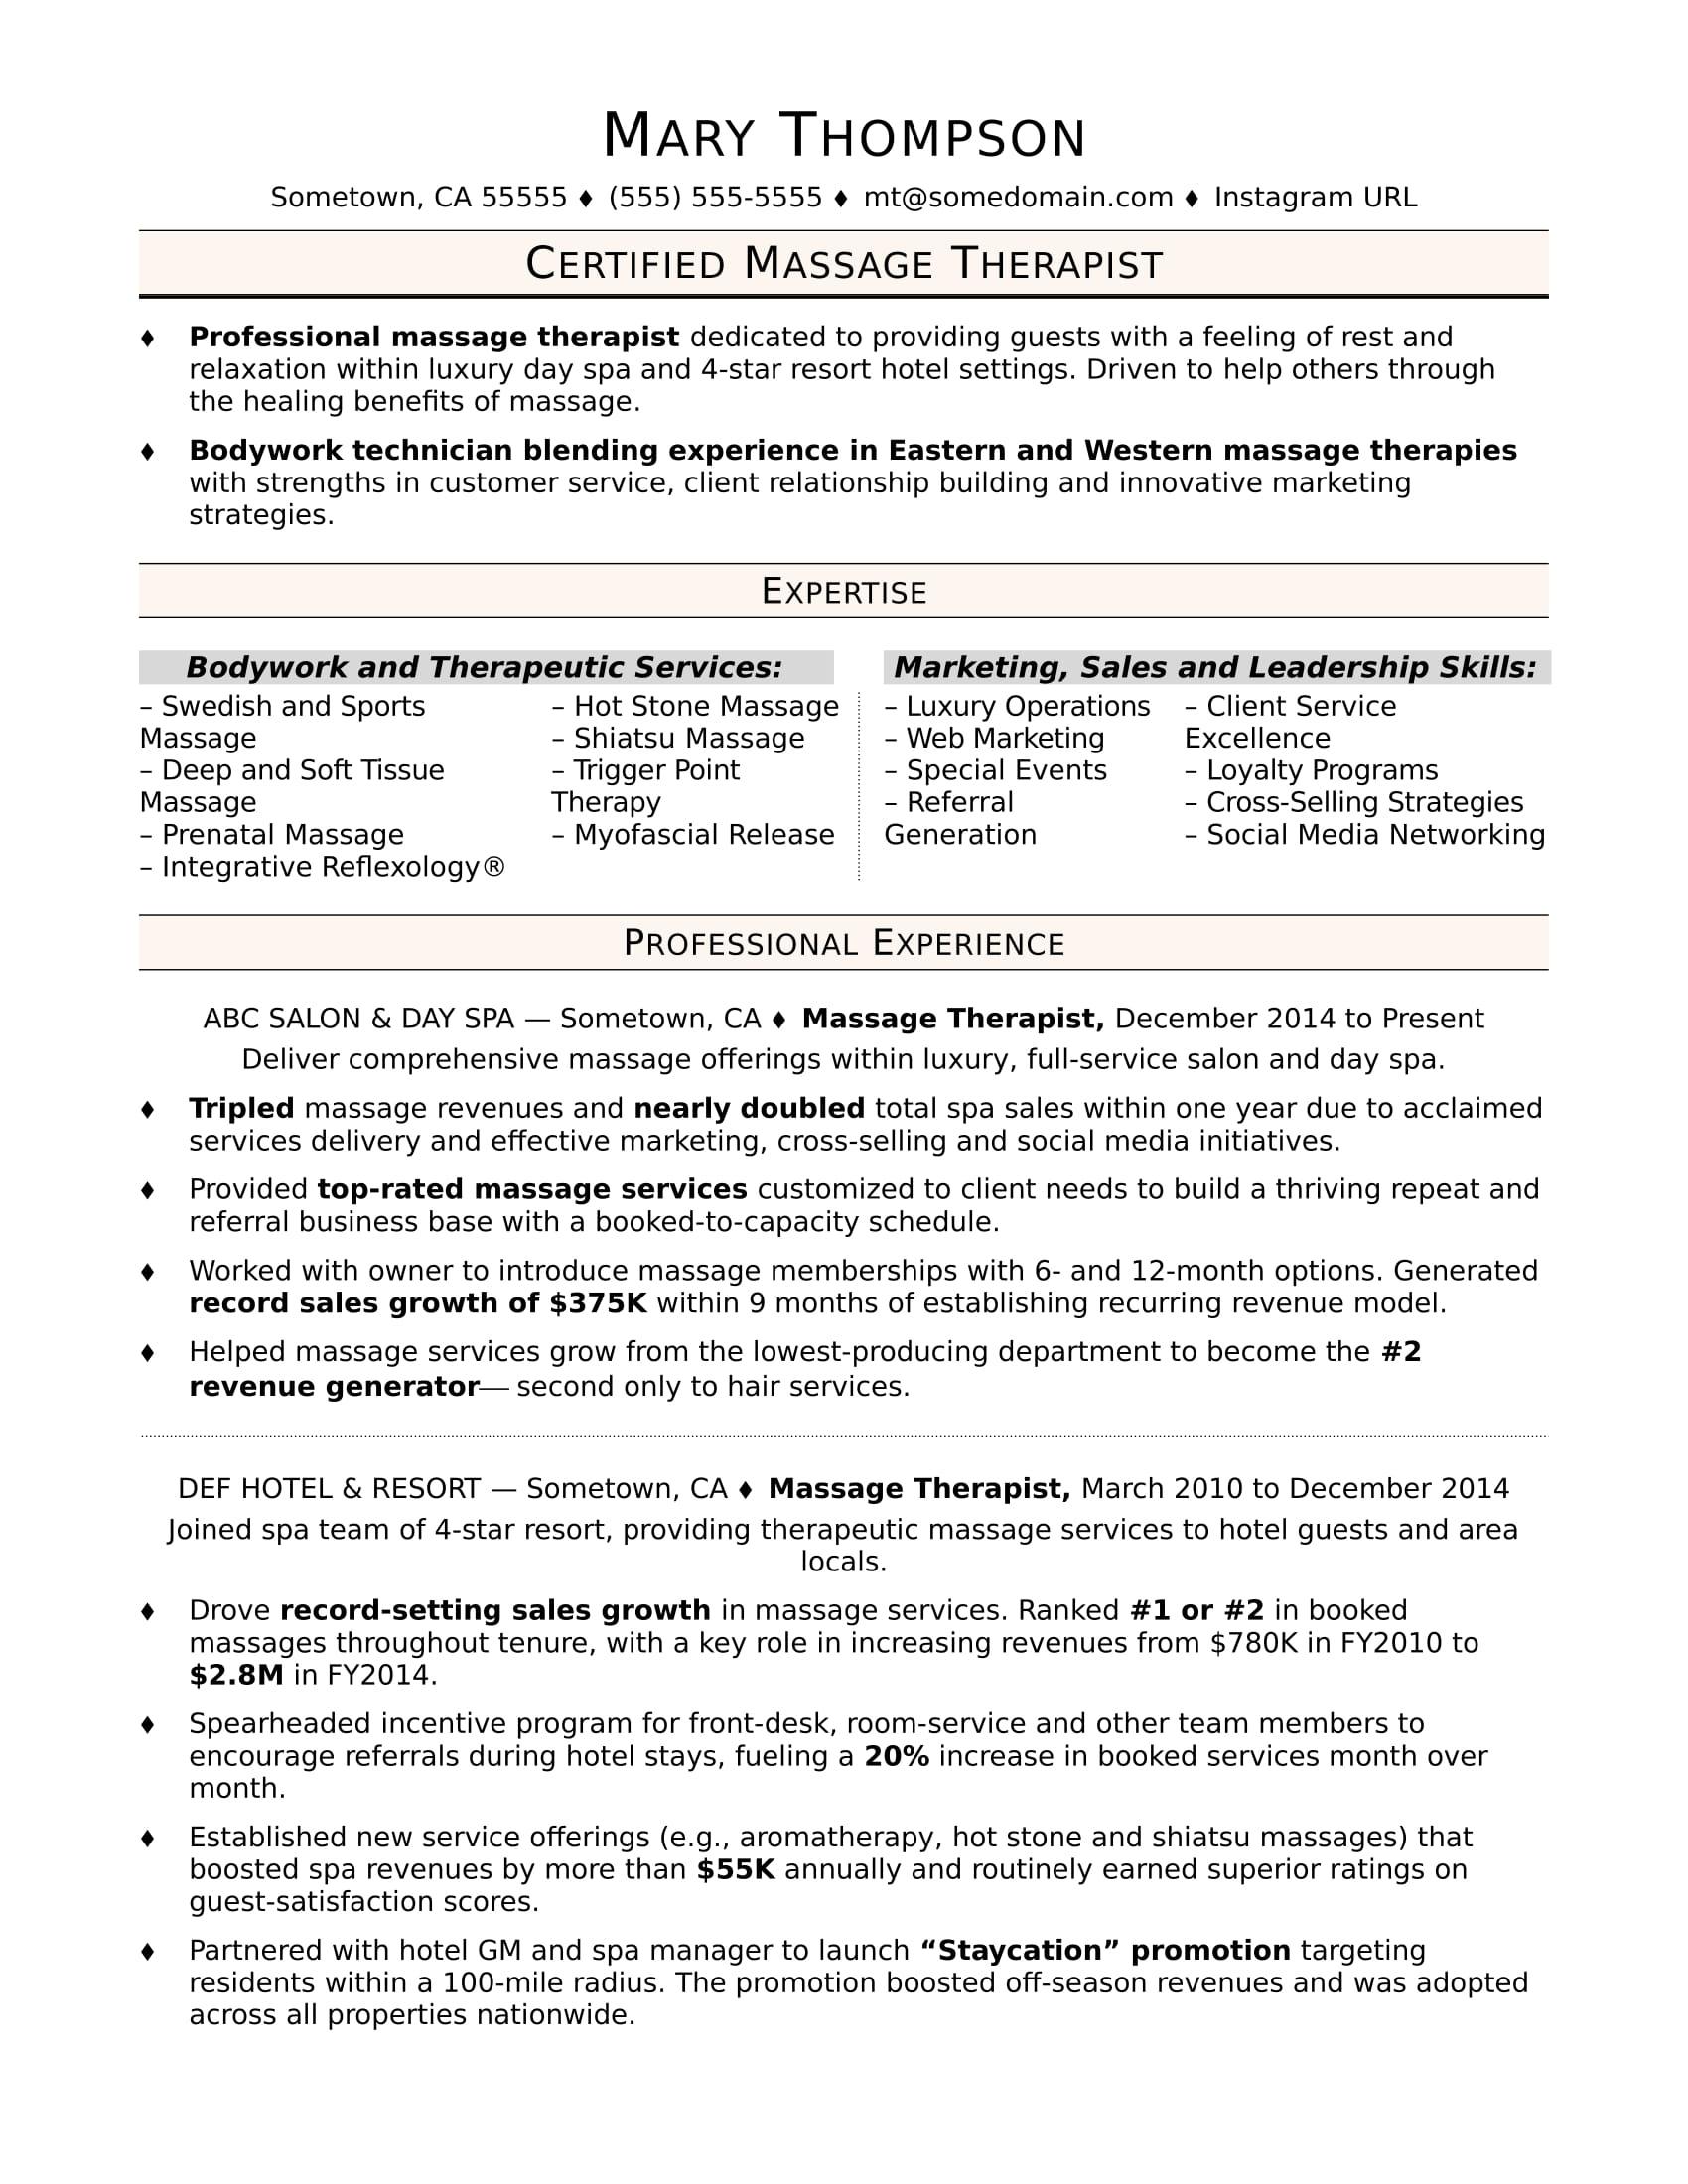 massage therapist ms word resume template